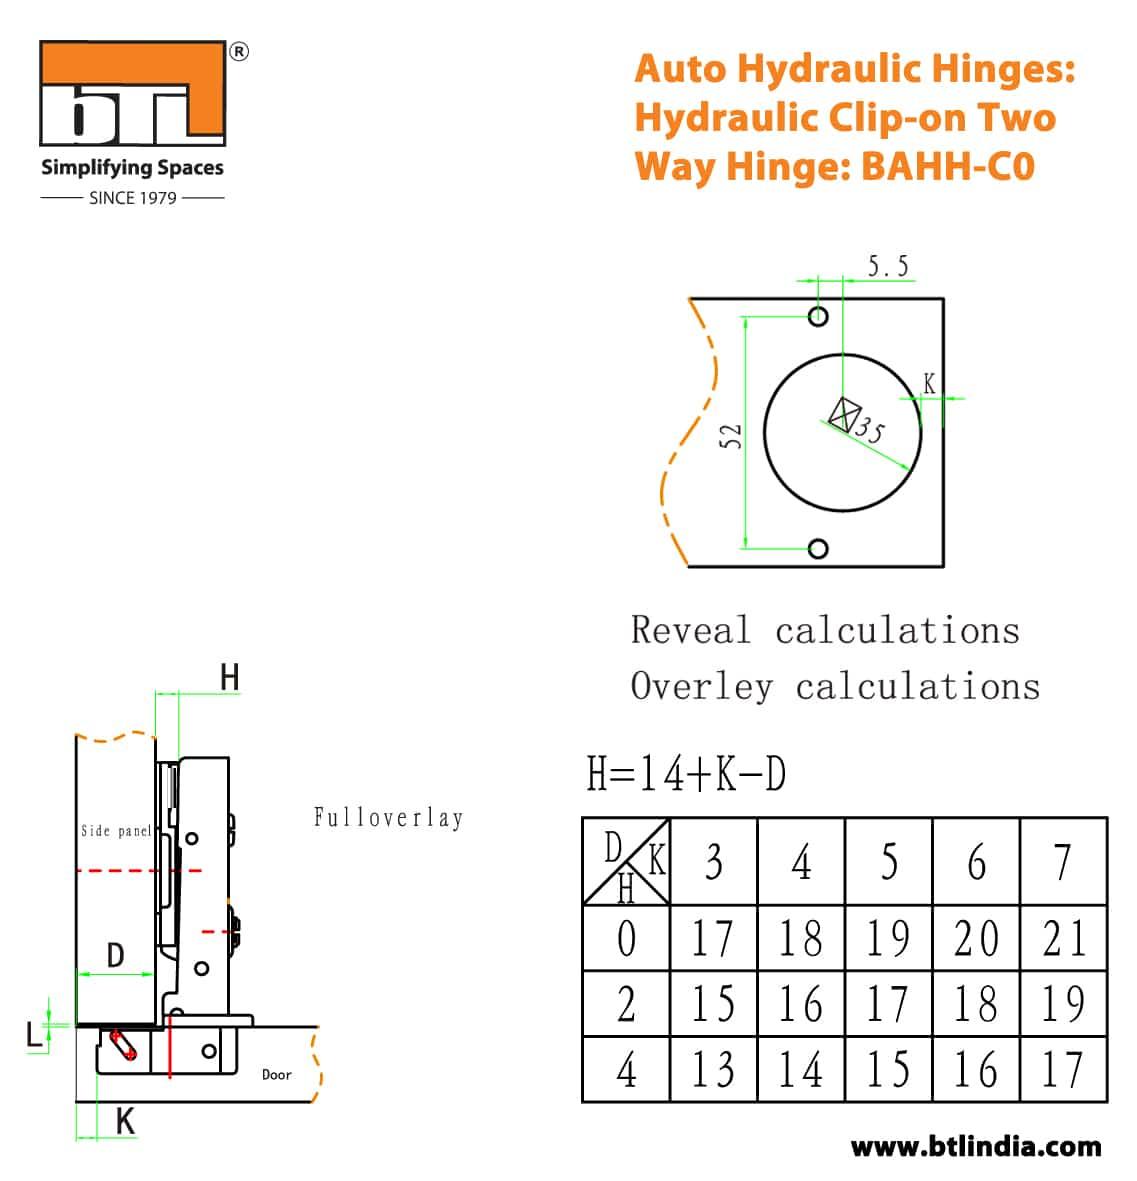 BTL BAHH-C0 Auto Hydraulic Hinge: Hydraulic Clip-on Two Way Hinge - Specifications